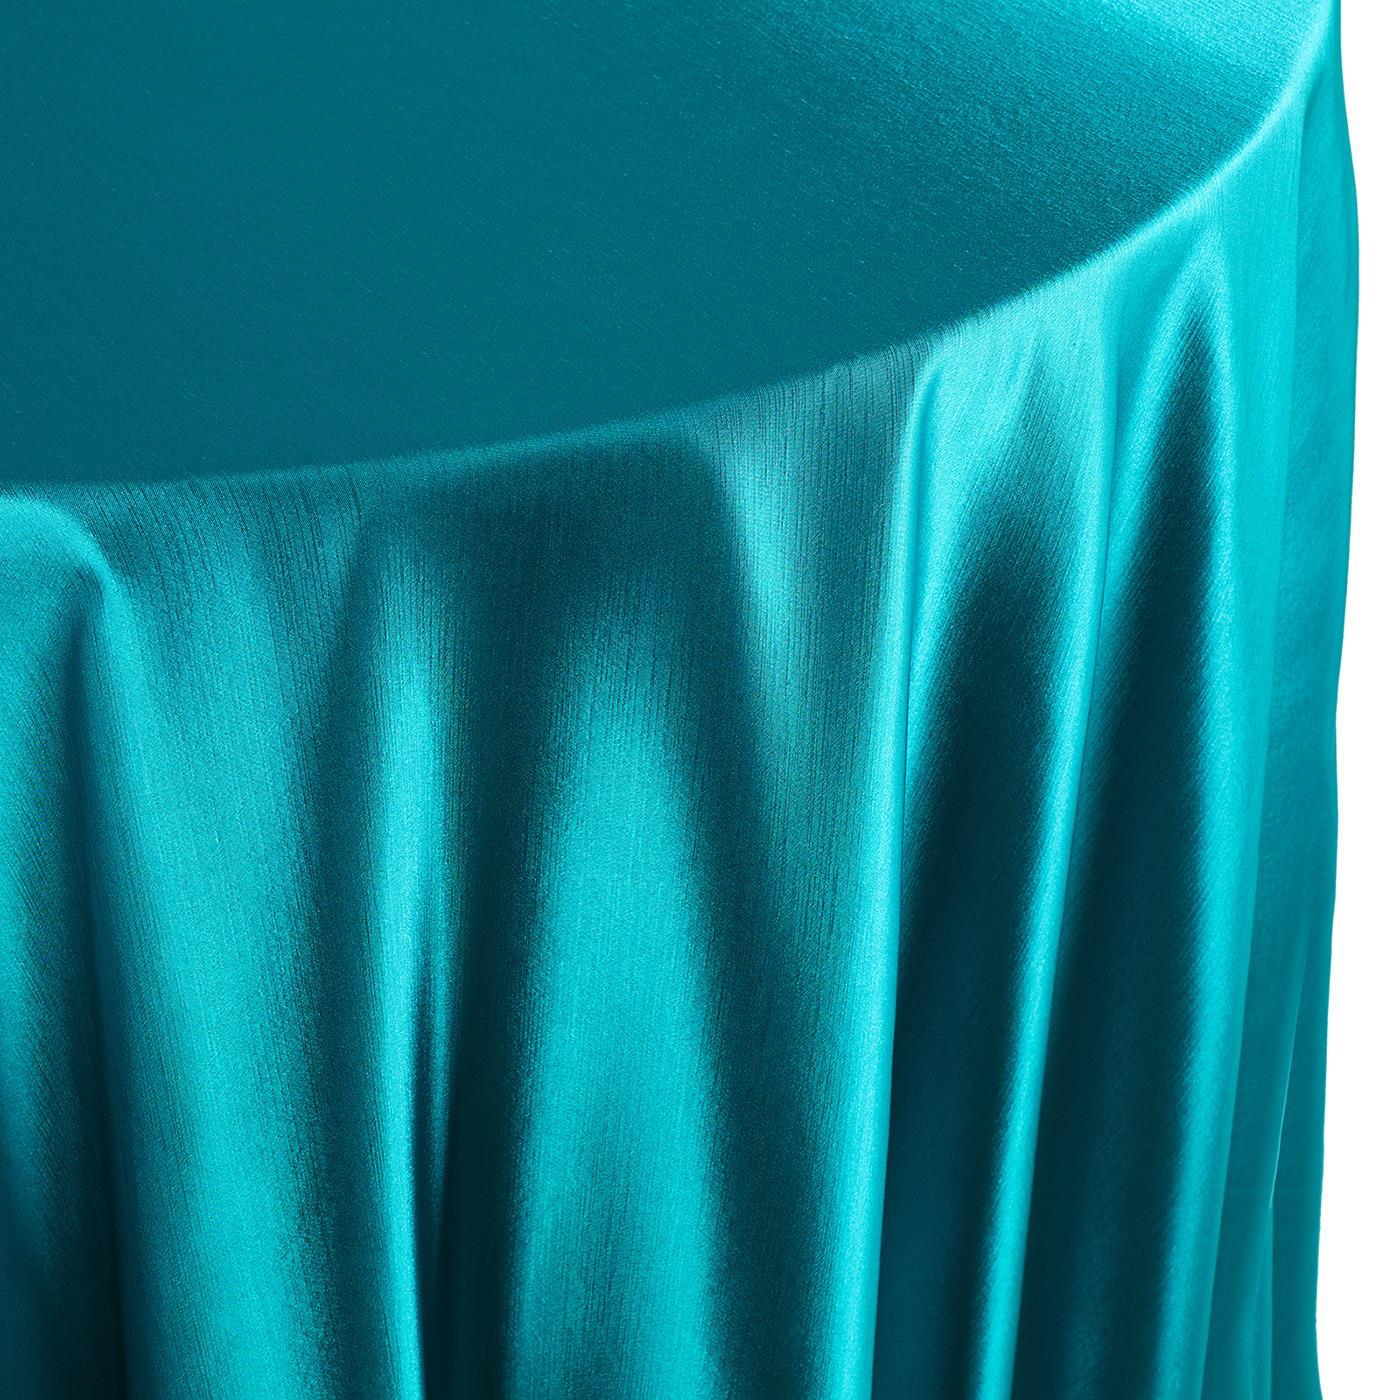 Turquoise - Majestic